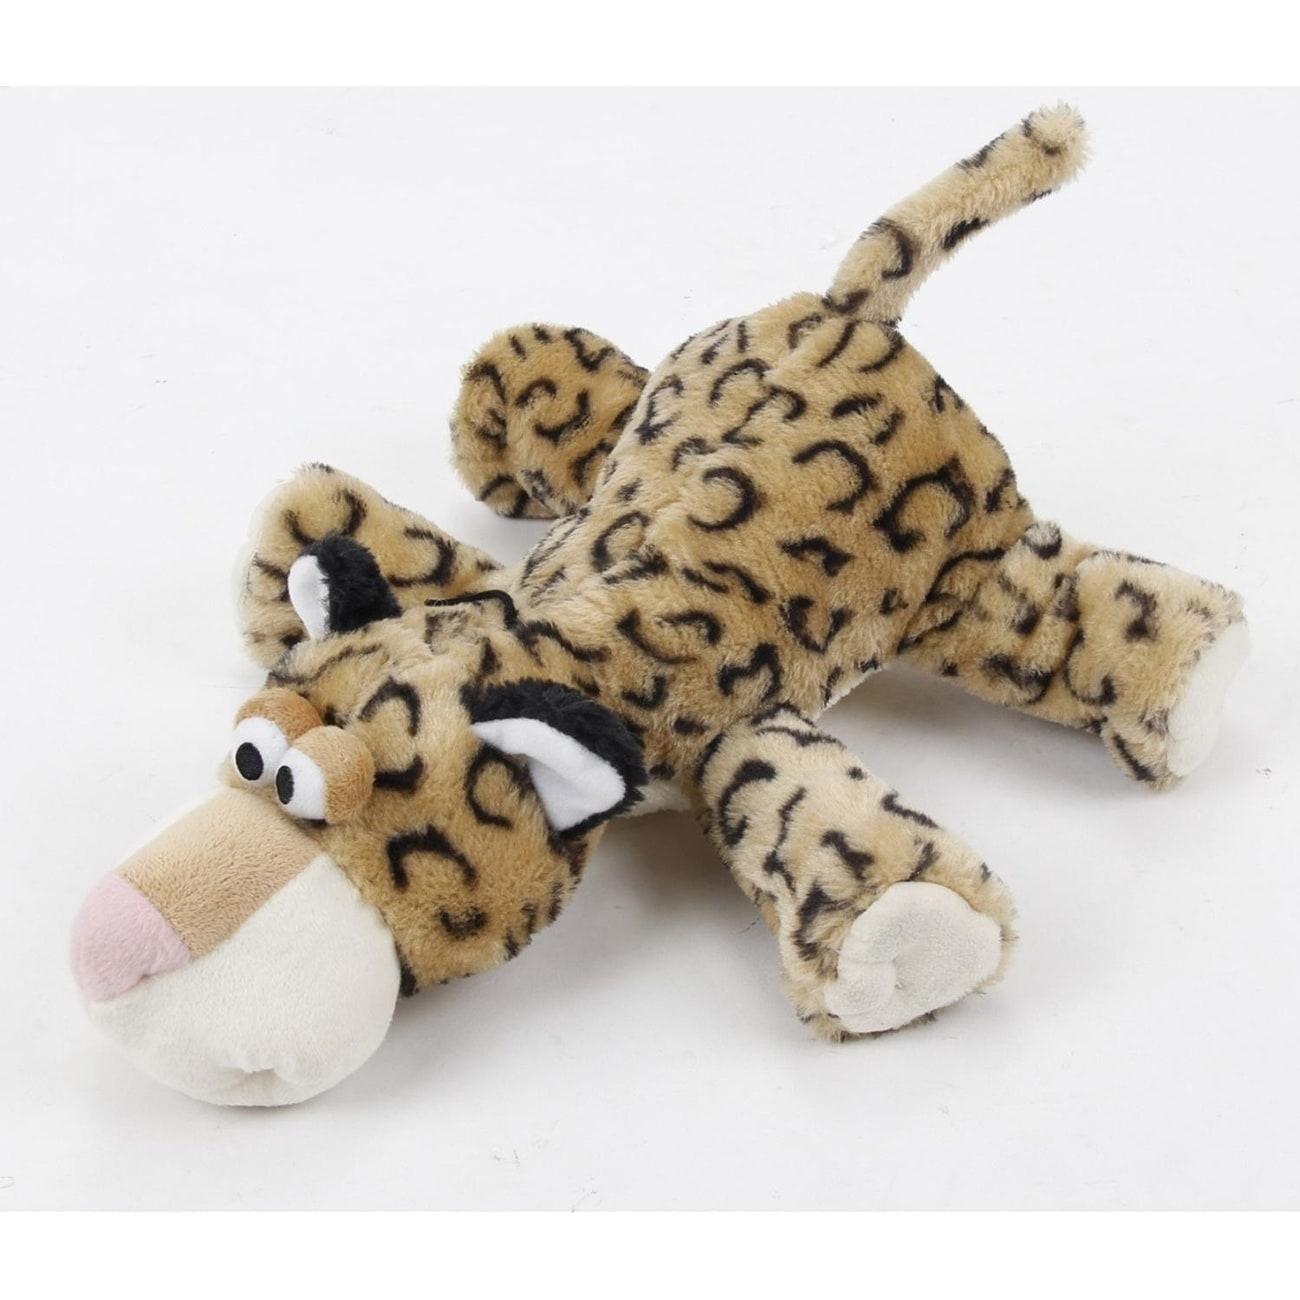 Shop 13 Plush Black And Brown Leopard Stuffed Animal Puppy Dog Chew